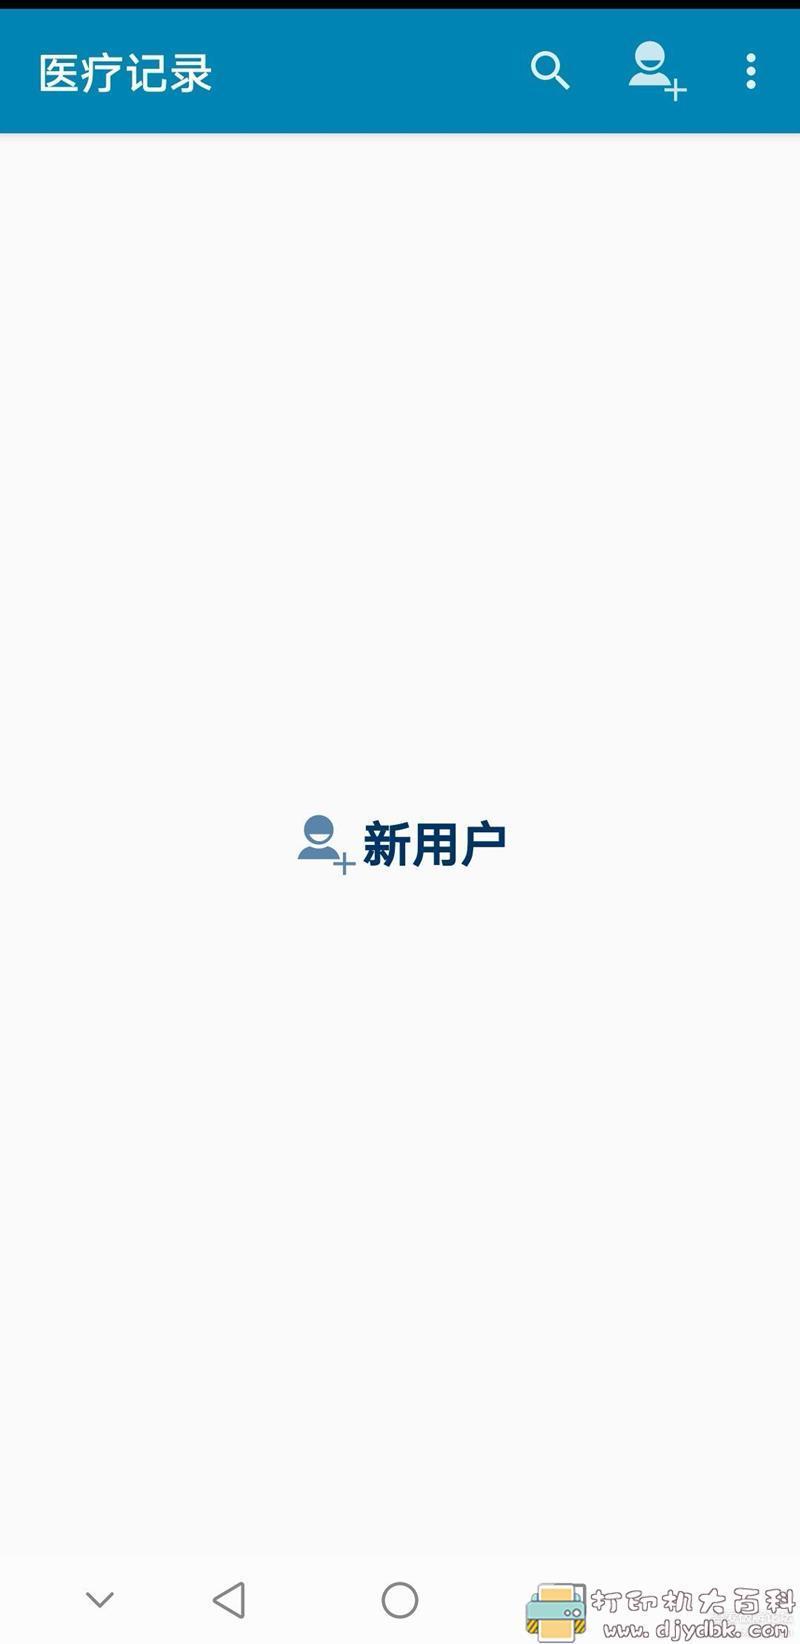 [Android]【医疗记录app】便携记录者患者医疗情况图片 No.1